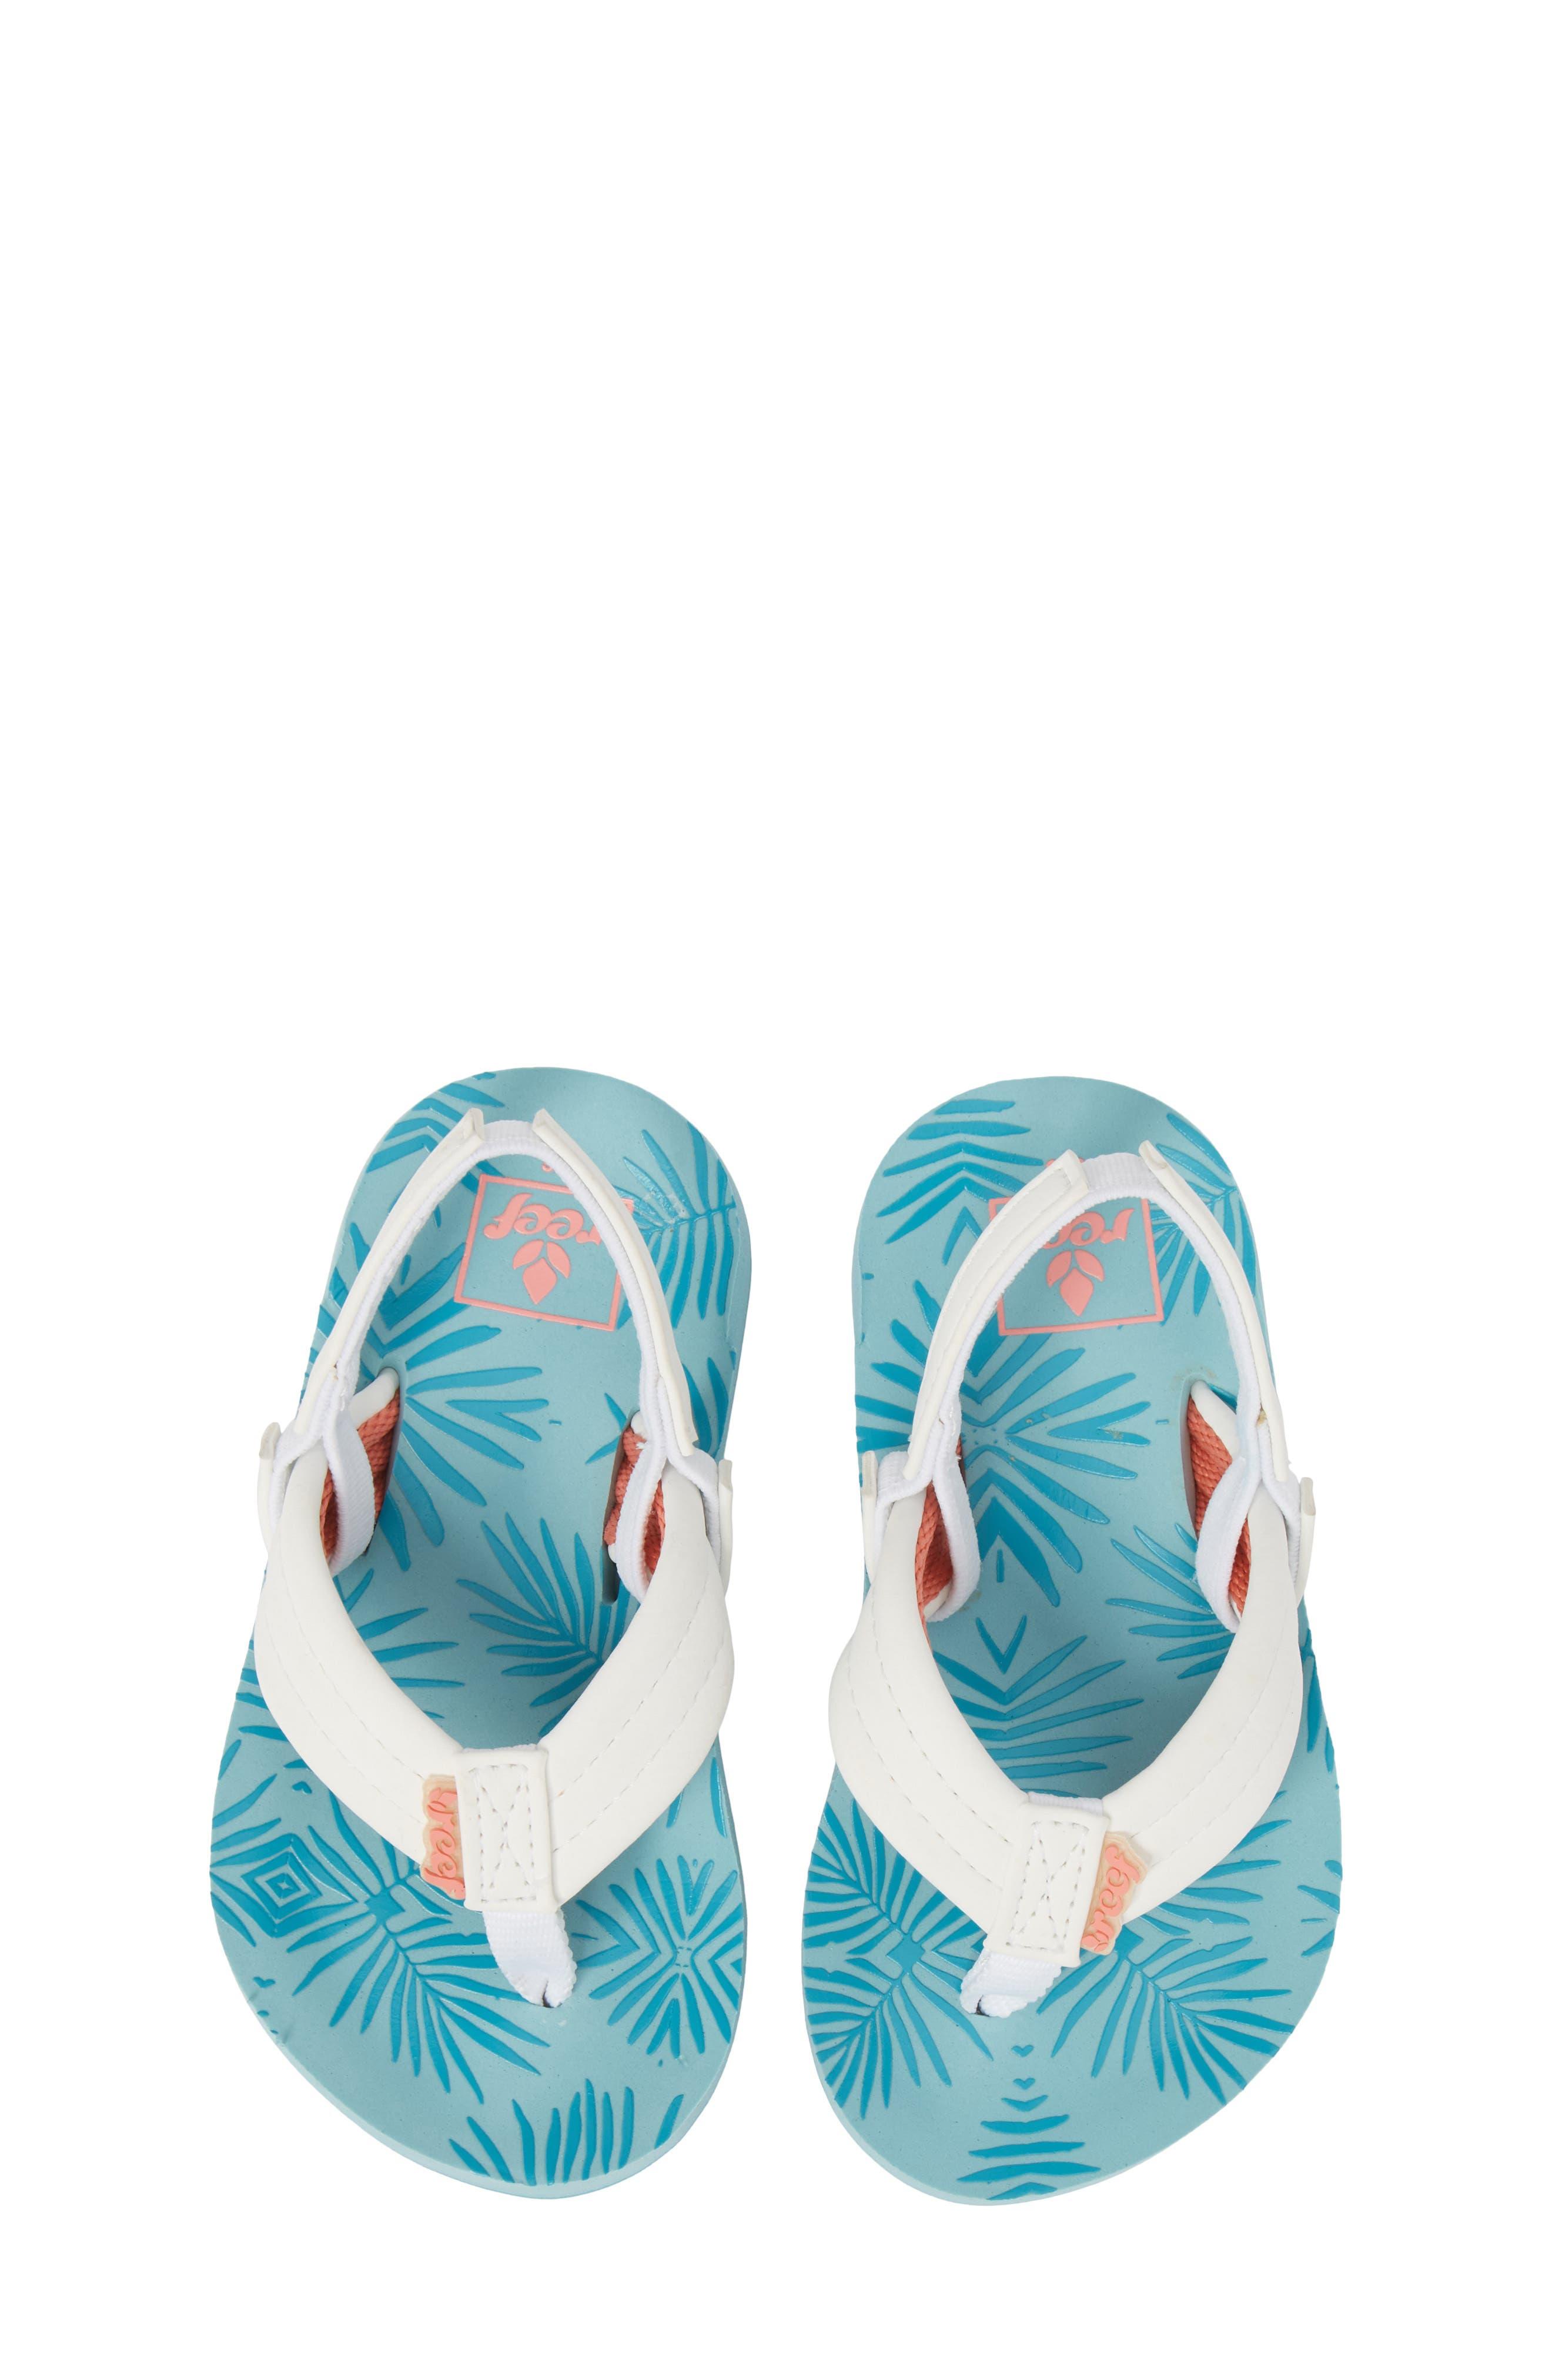 Little Reef Footprints Sandal,                             Main thumbnail 1, color,                             Blue